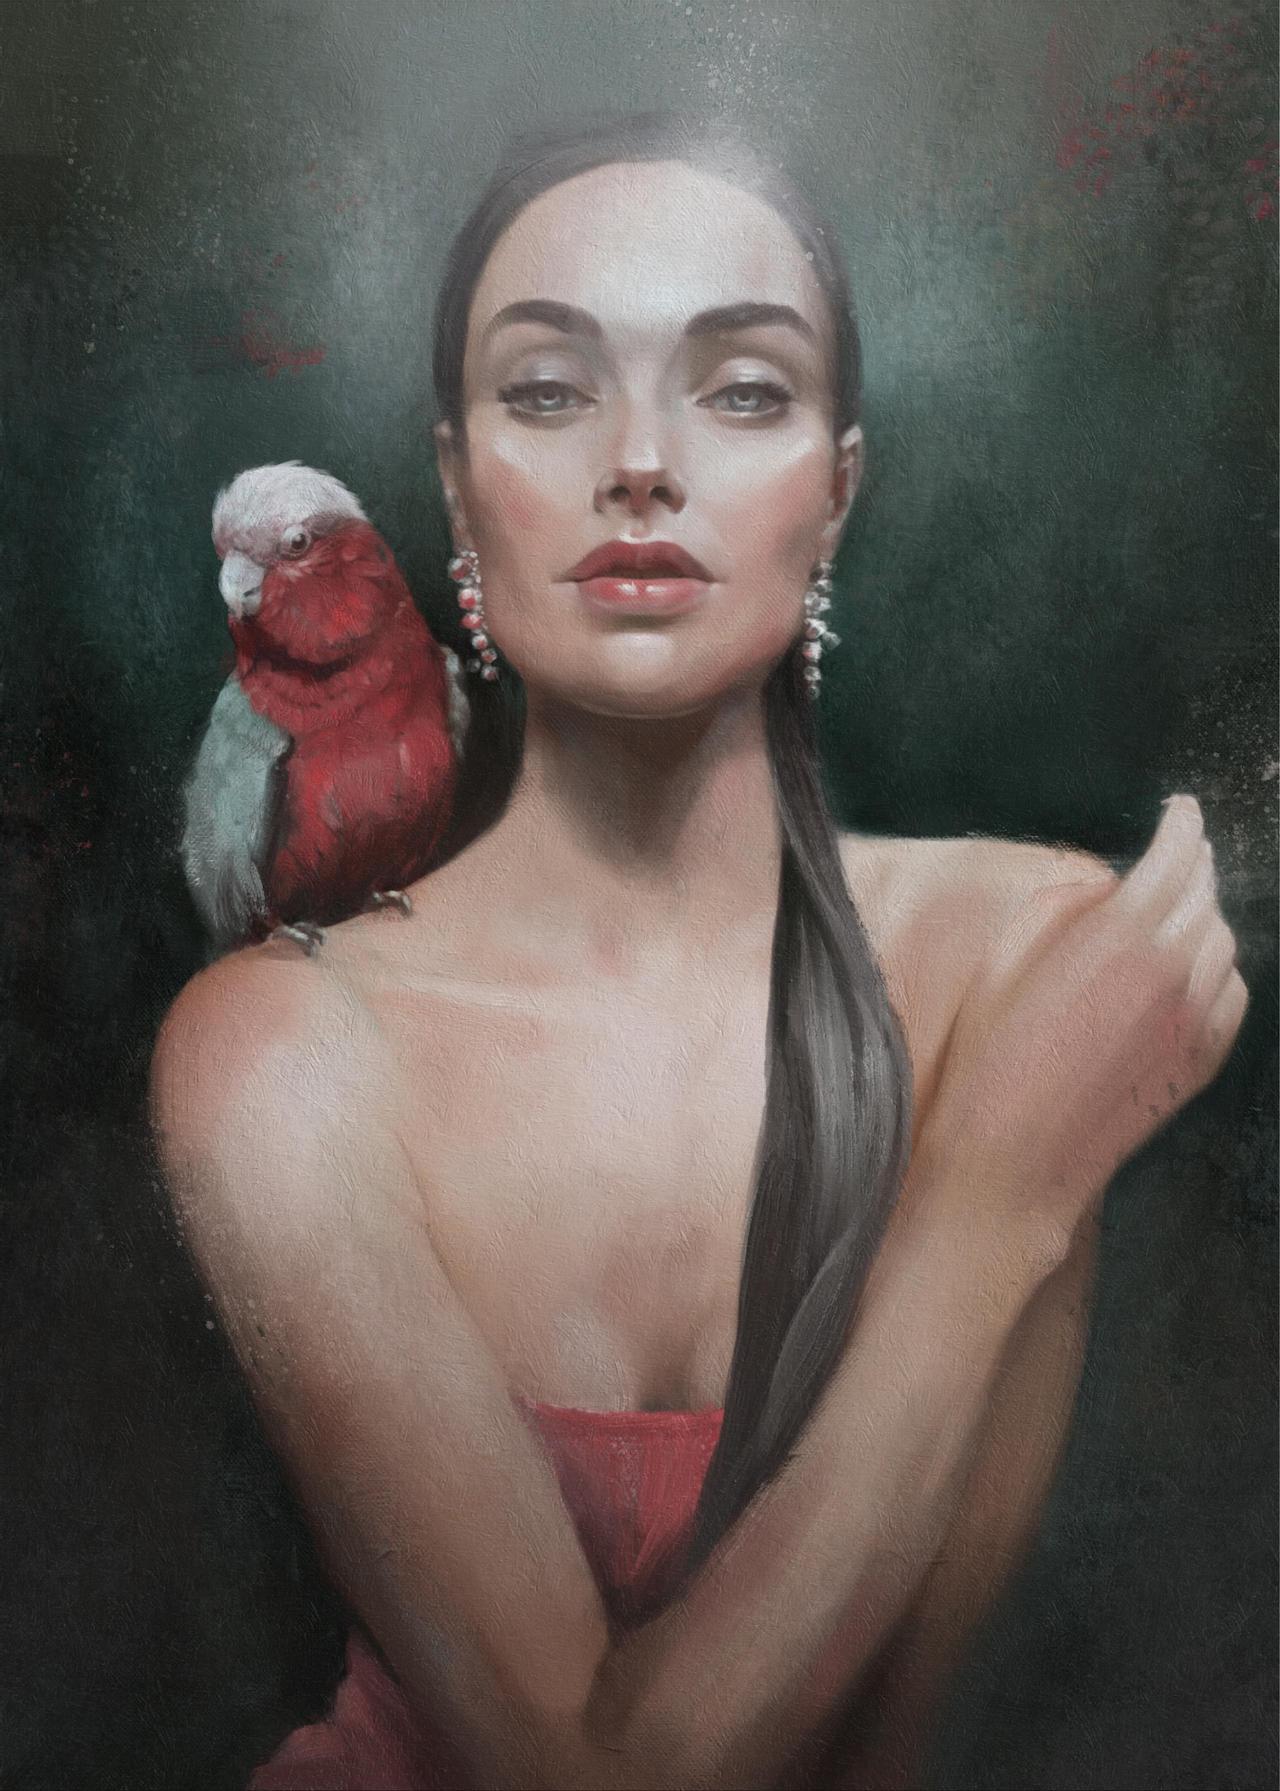 Фото Девушка с попугаем на плече, by SiaAnikeeva